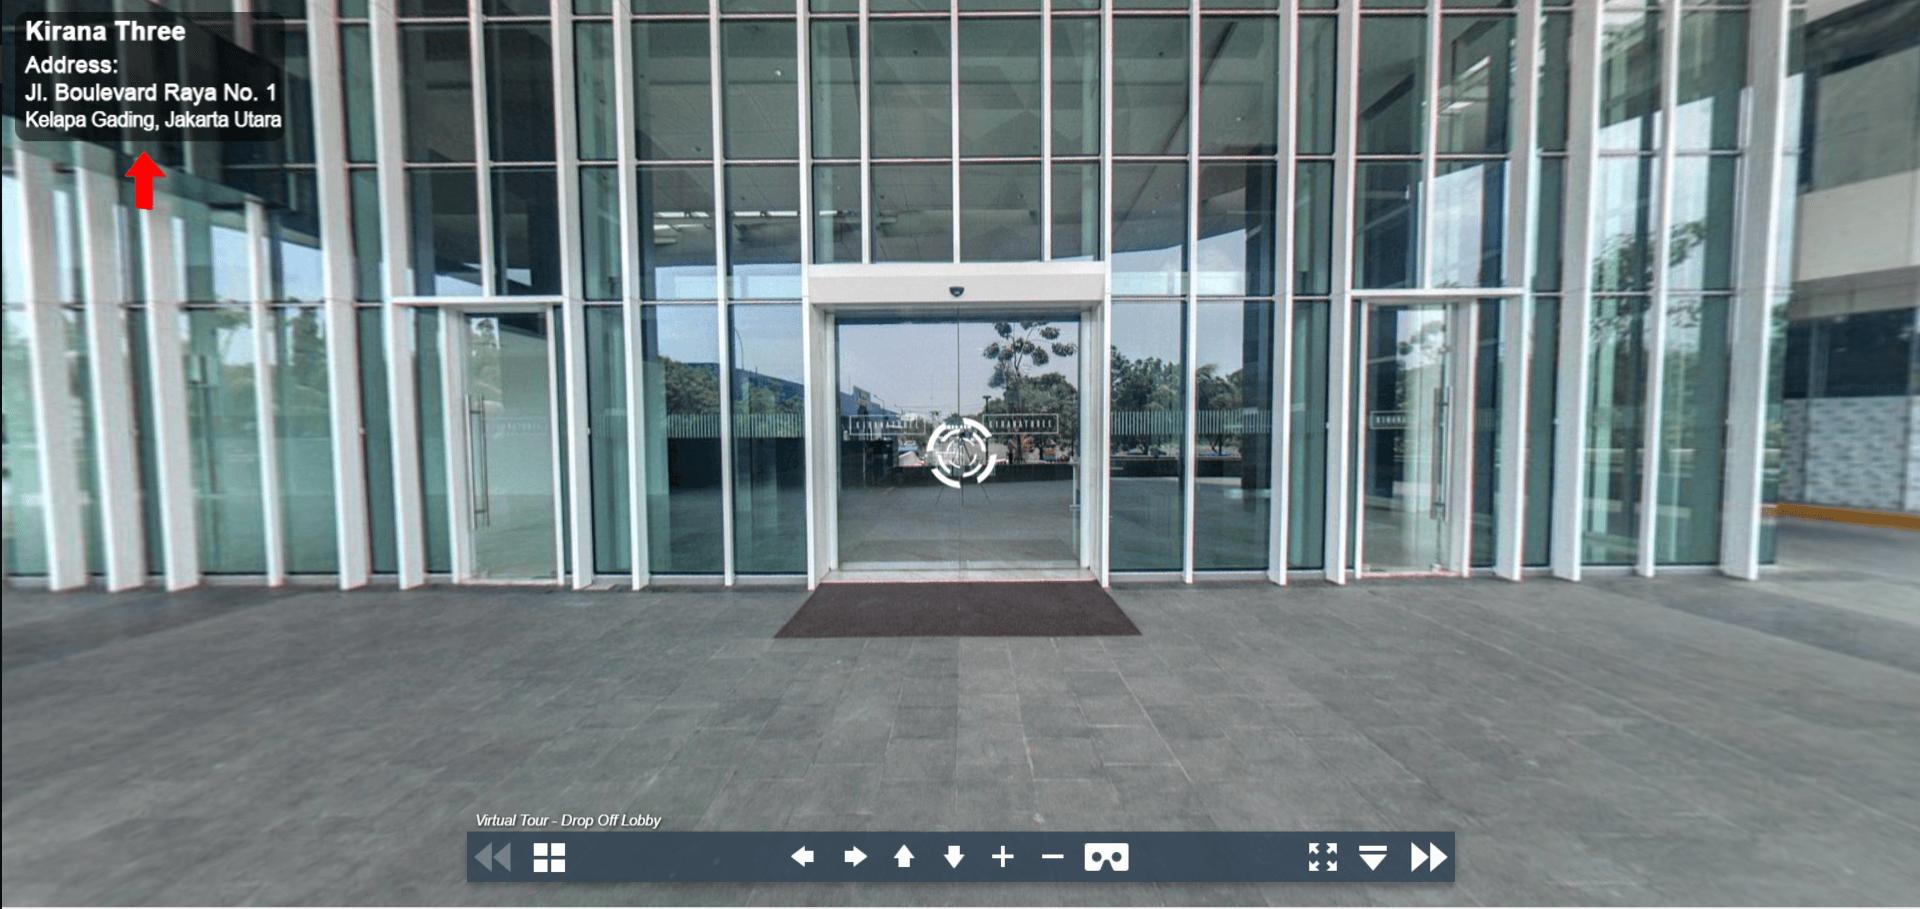 Sewa Kantor Gedung Kirana Three  Jakarta utara Kelapa Gading  Jakarta Virtual Reality